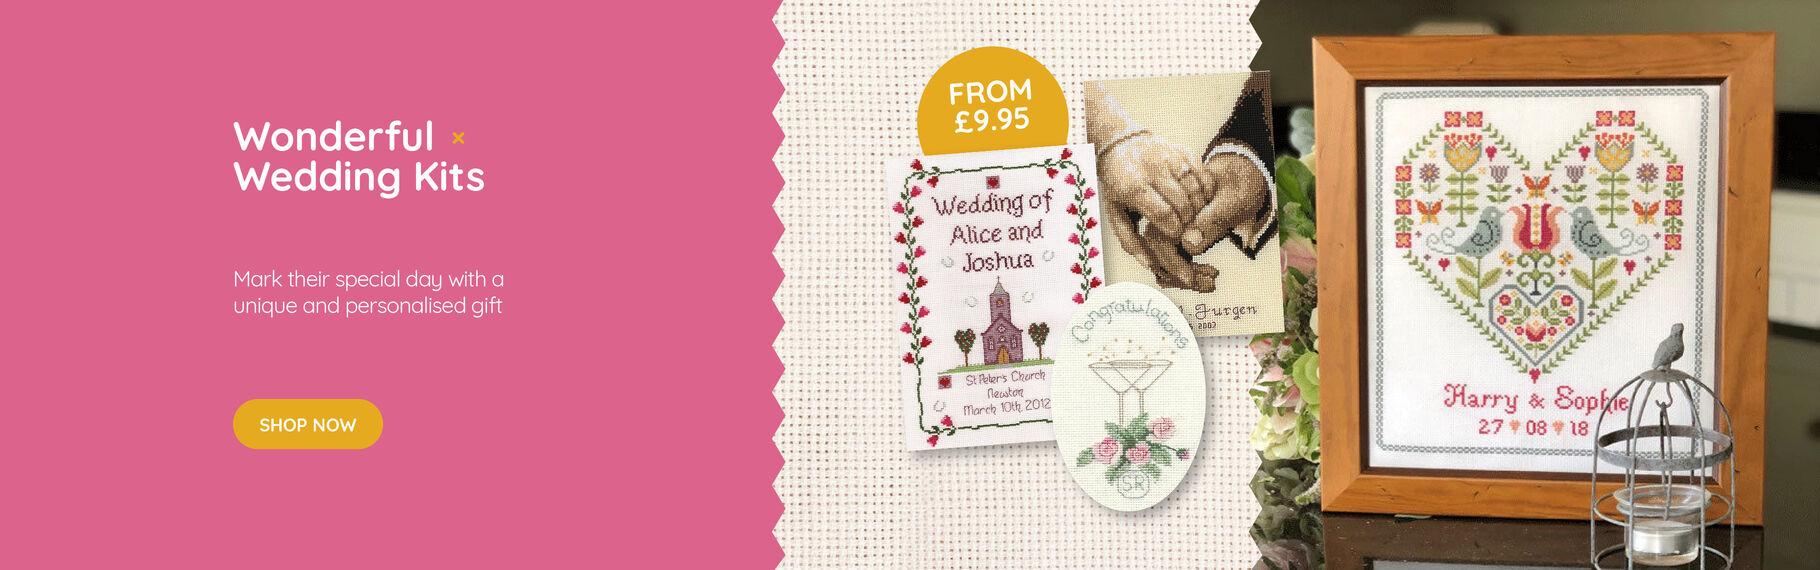 Wonderful Wedding Kits